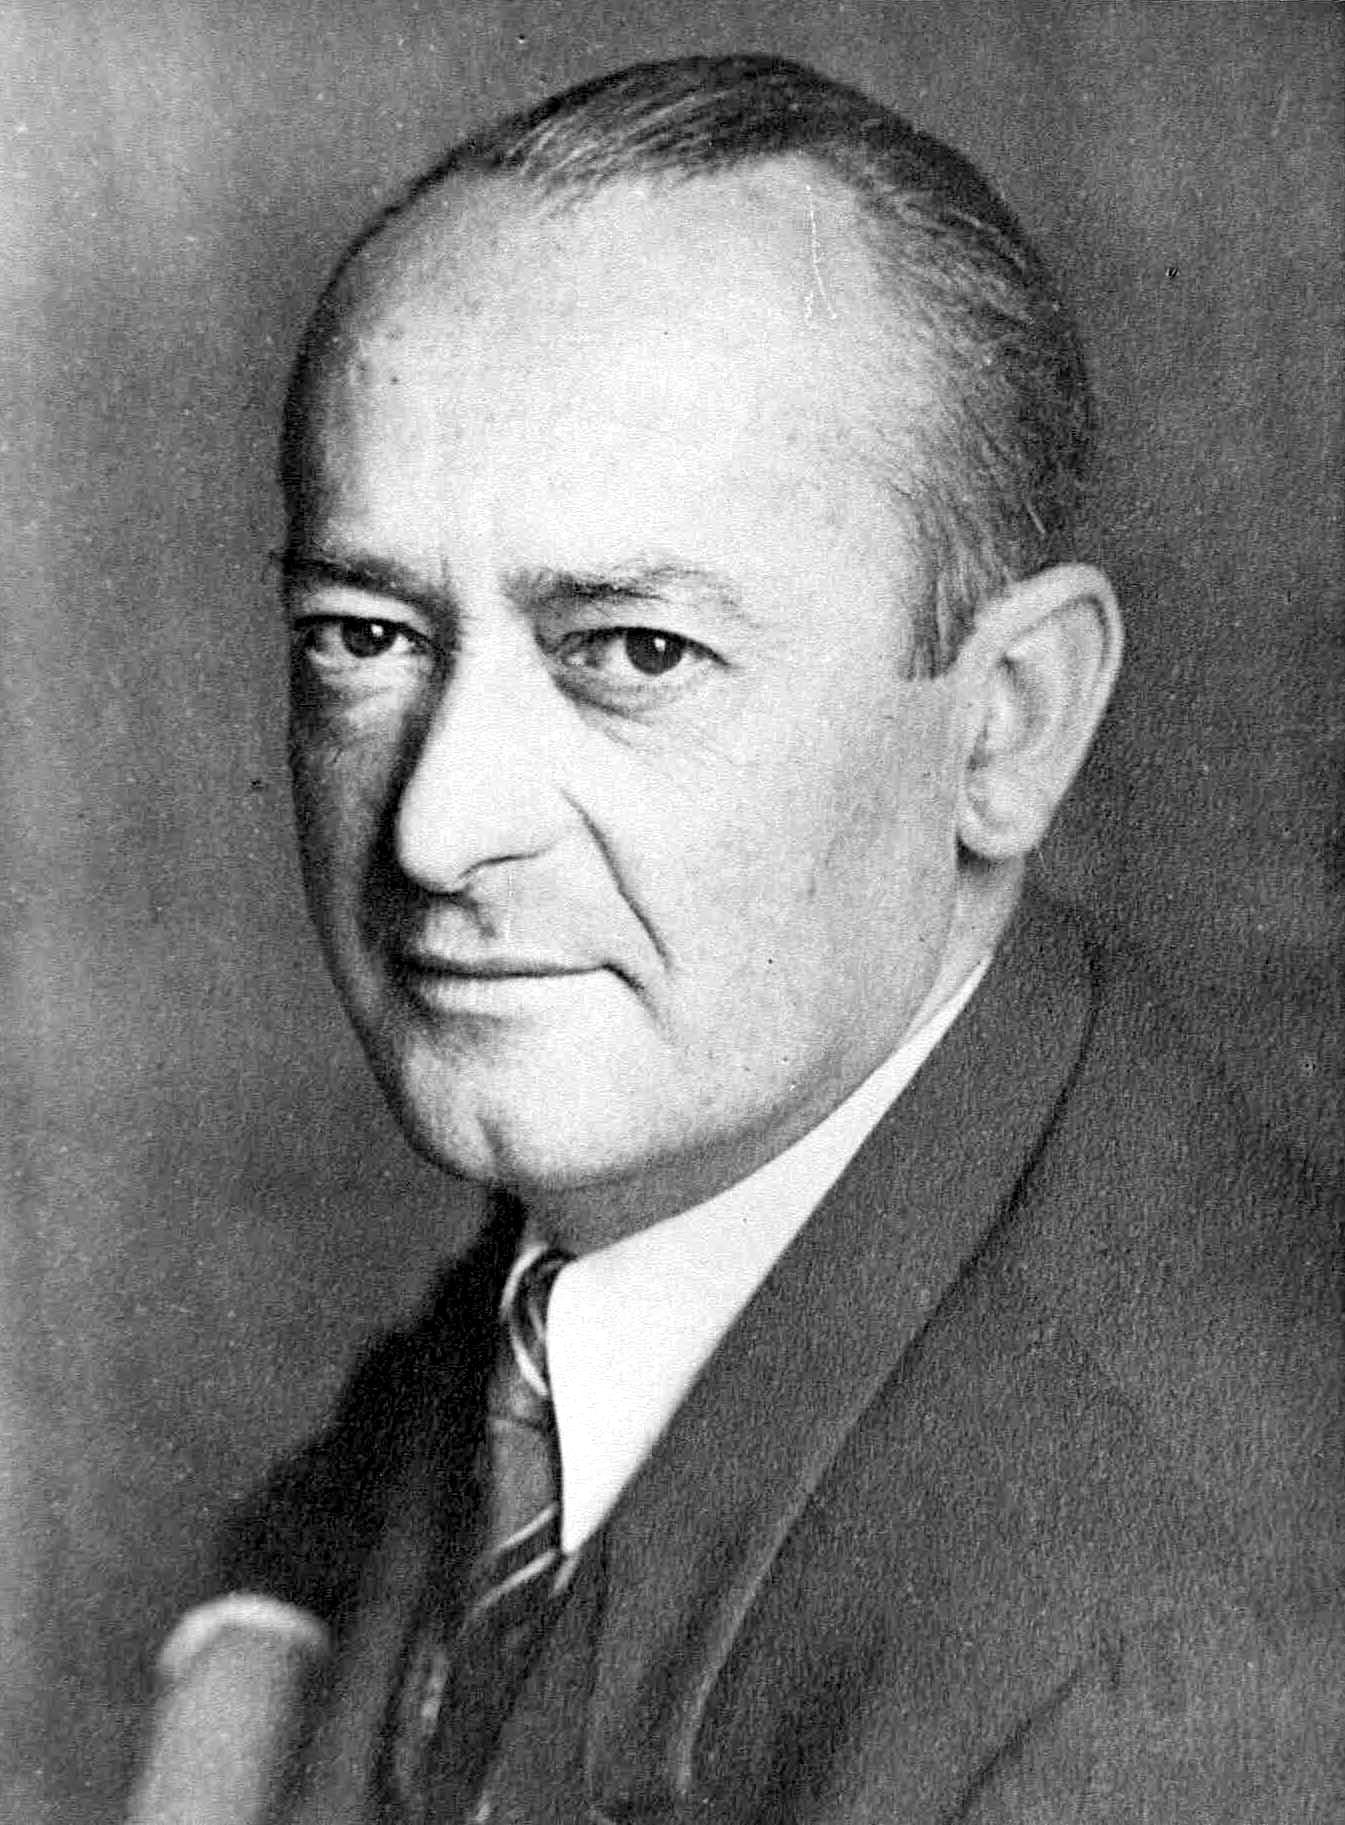 José Santos González Vera